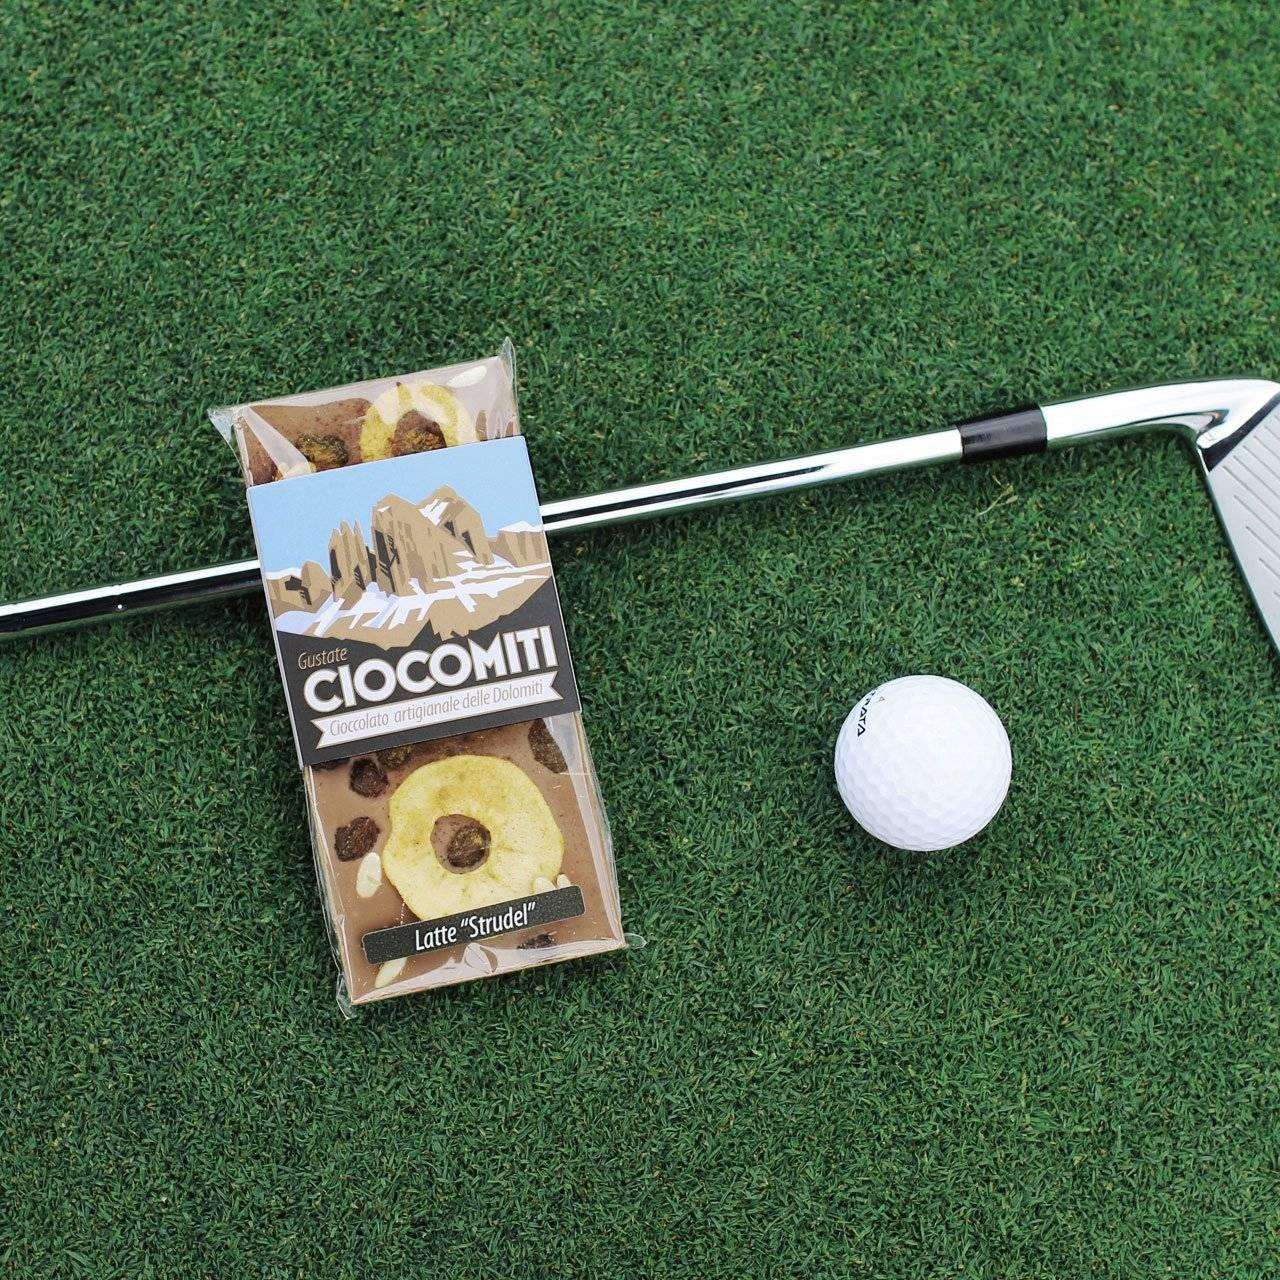 Ciocomiti - Chocolate & Golf - Eijiro Matsumi Limited